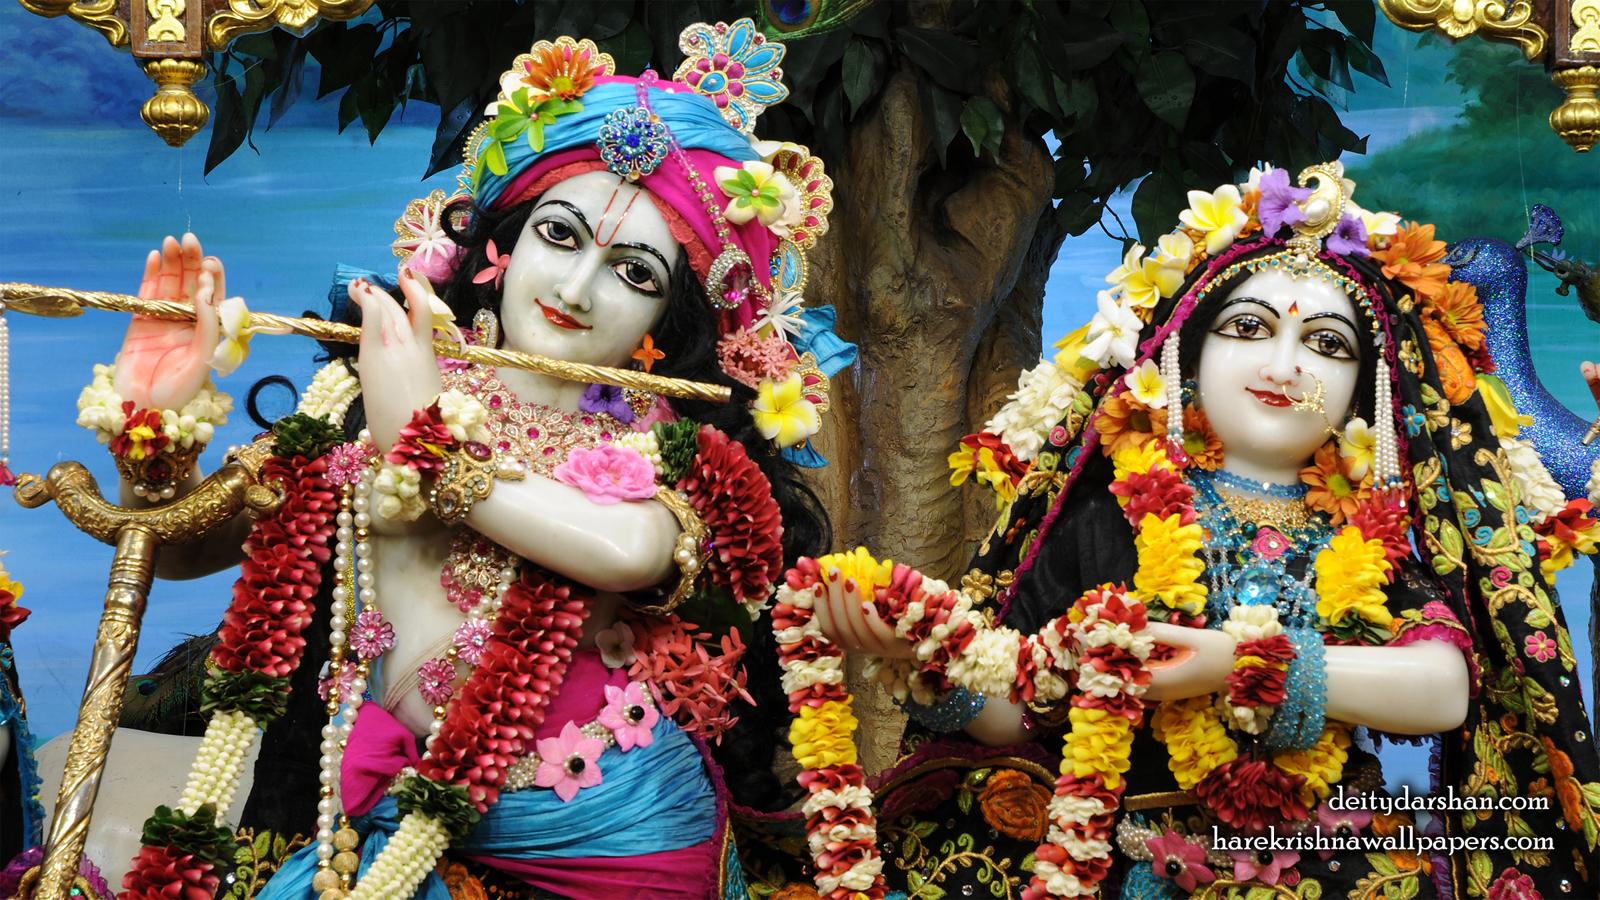 Sri Sri Radha Gopinath Close up Wallpaper (053) Size 1600x900 Download